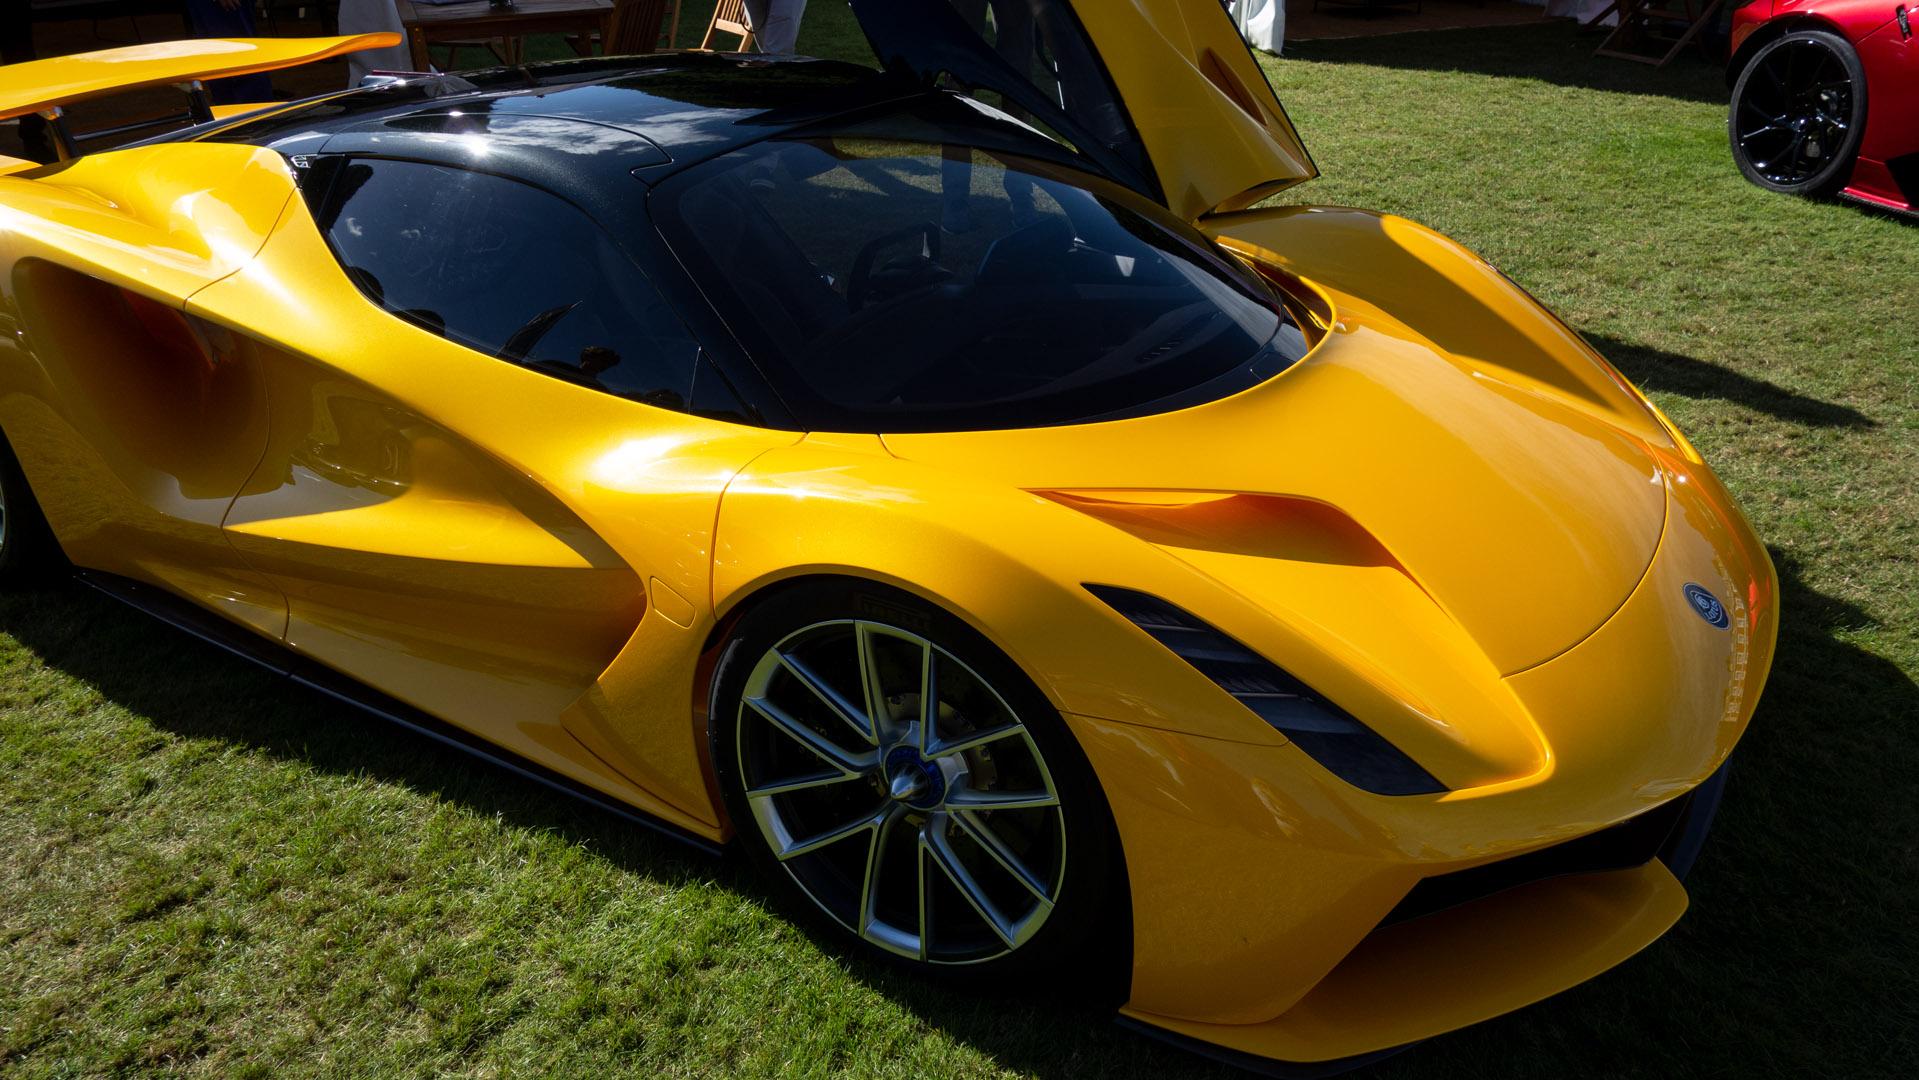 Lotus Evija close up